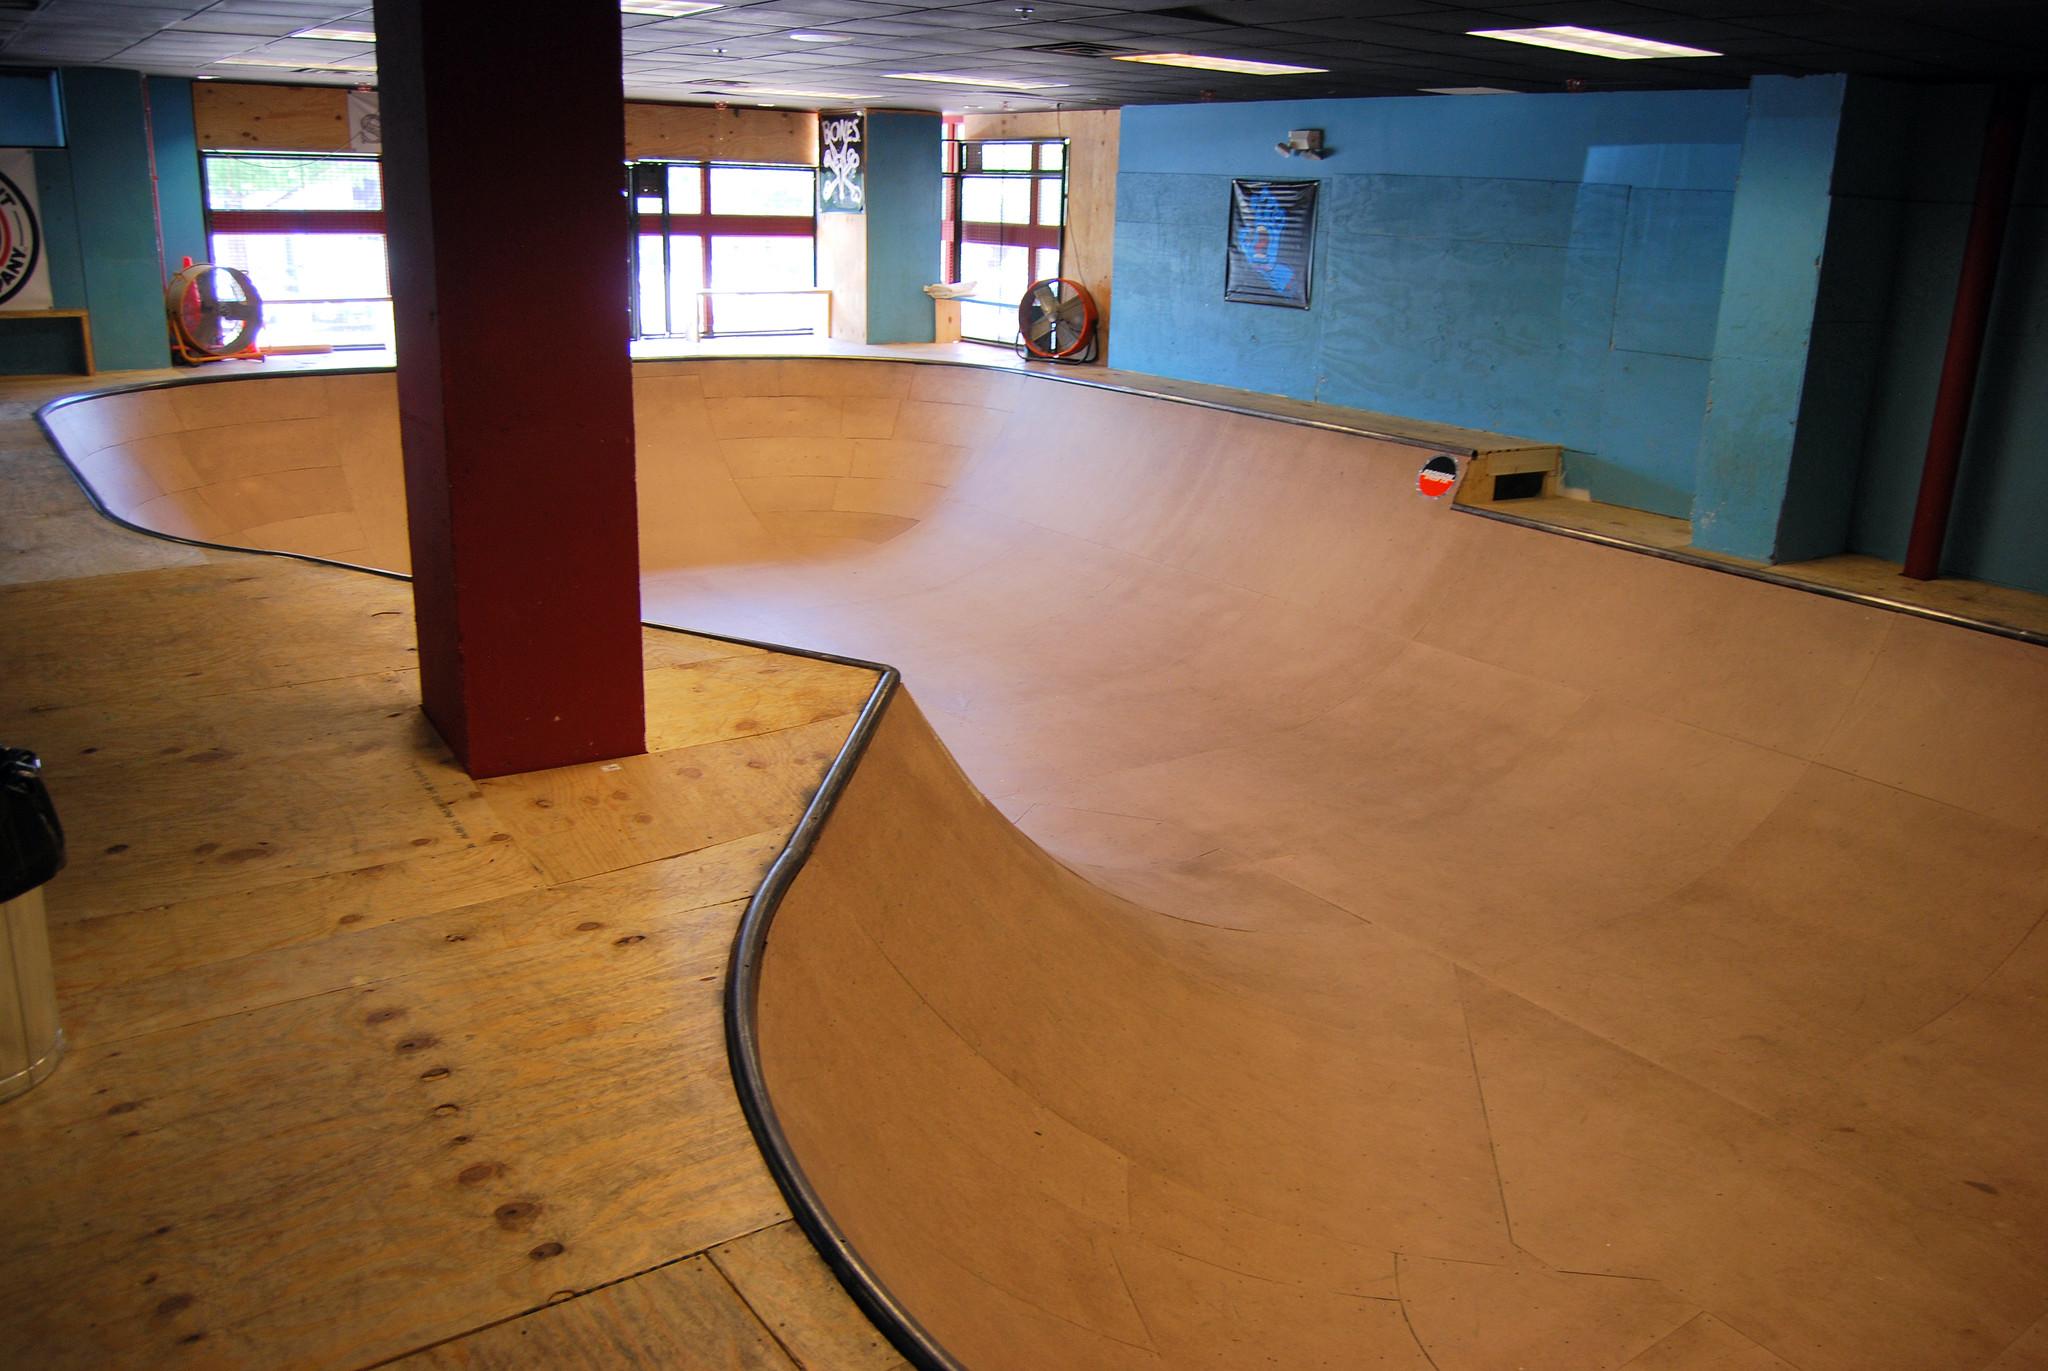 The Point Skate Shop Indoor Wooden Skateboarding Bowl The Point - Skate court flooring